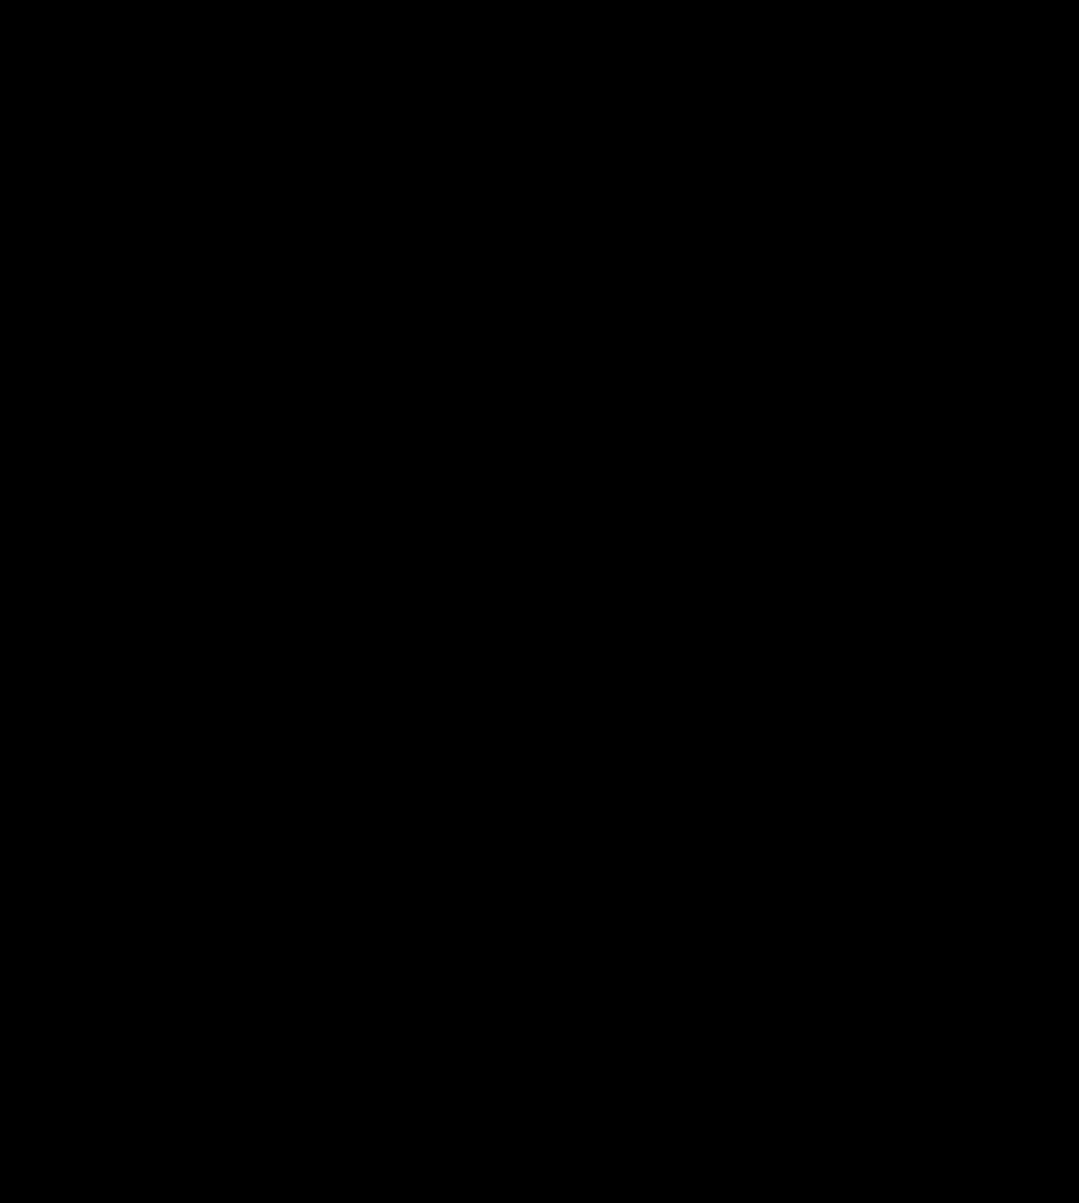 Prius fermentado en barrica